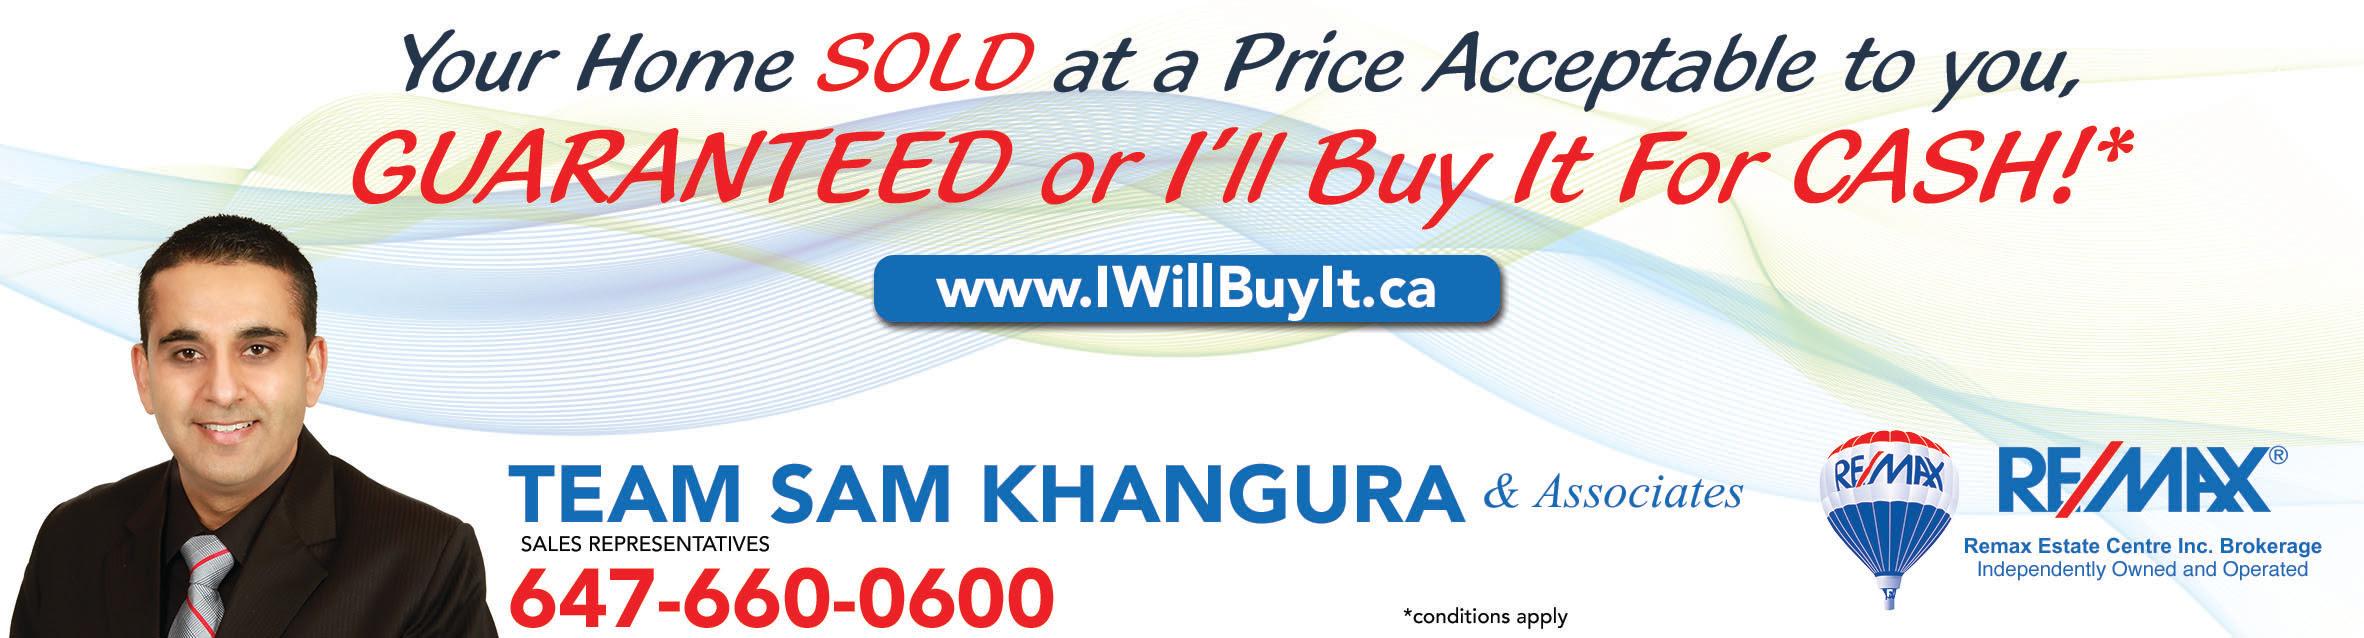 Team Sam Khangura Banner.jpg